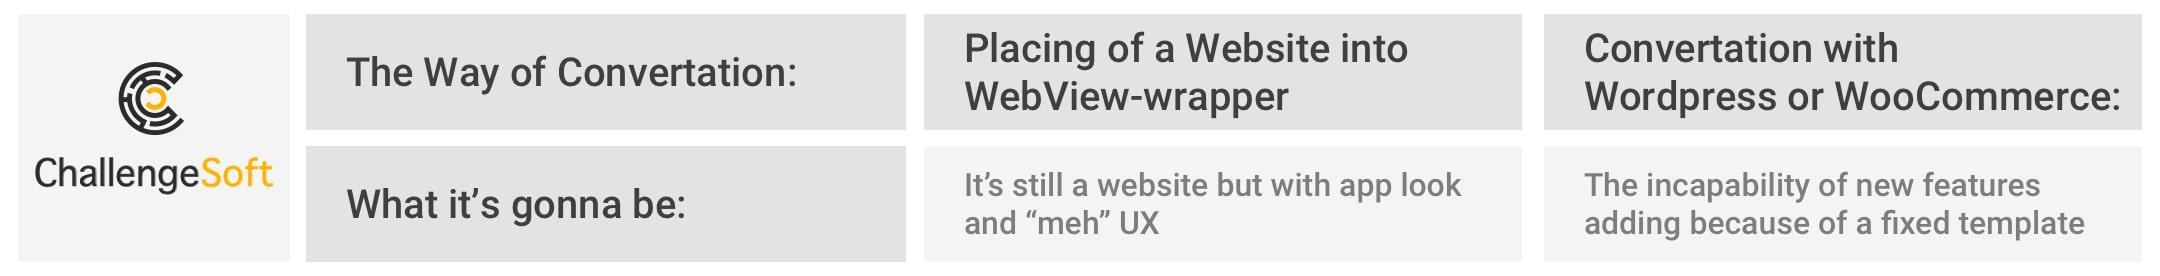 Ways of Website Convertation